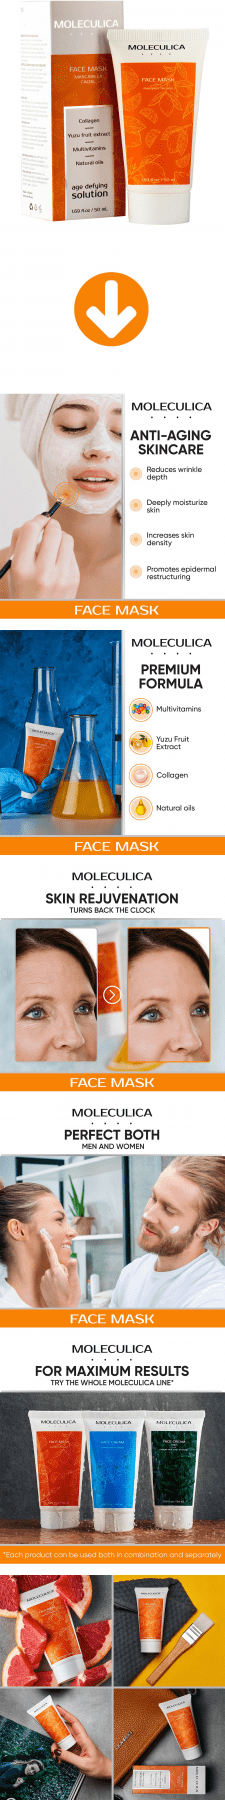 Листинг Amazon - Moleculica Anti Aging Face Mask